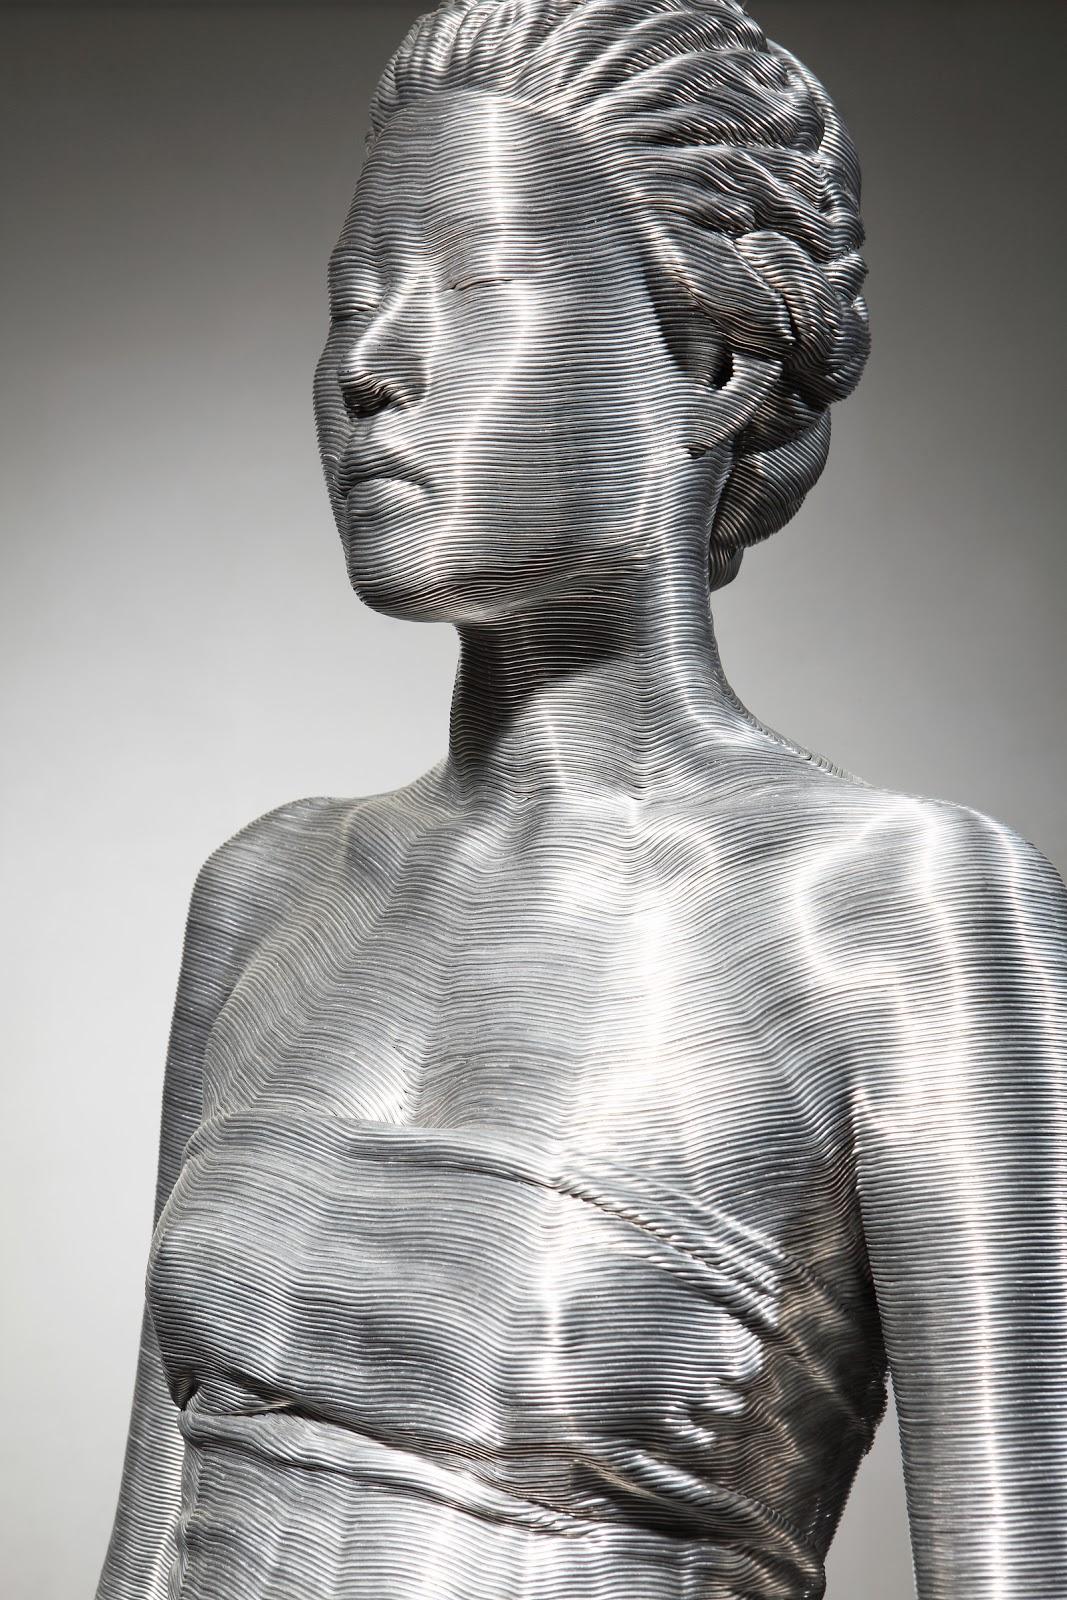 03-Park-Seung-Mo-South-Korean-Artist-&-Sculptor-Wire-Sculpture-www-designstack-co